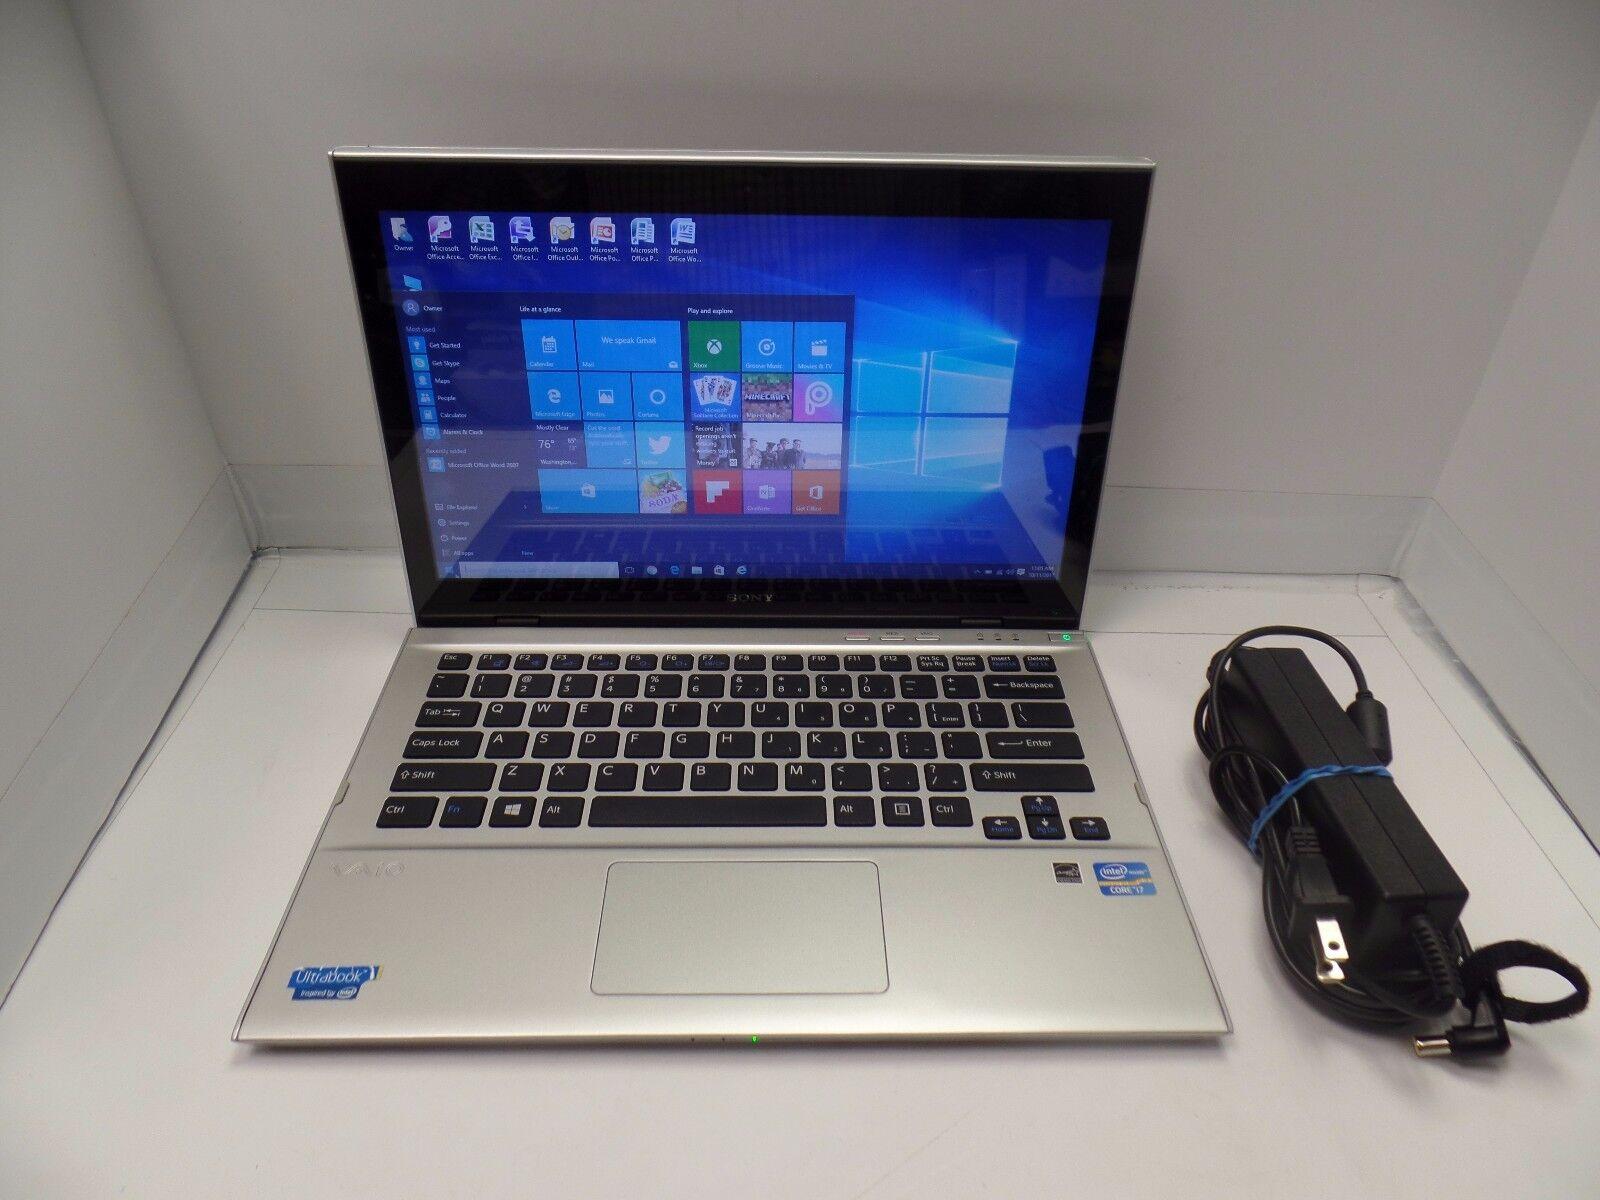 Driver for Sony Vaio VPCEG13FX/B Intel Wireless Display